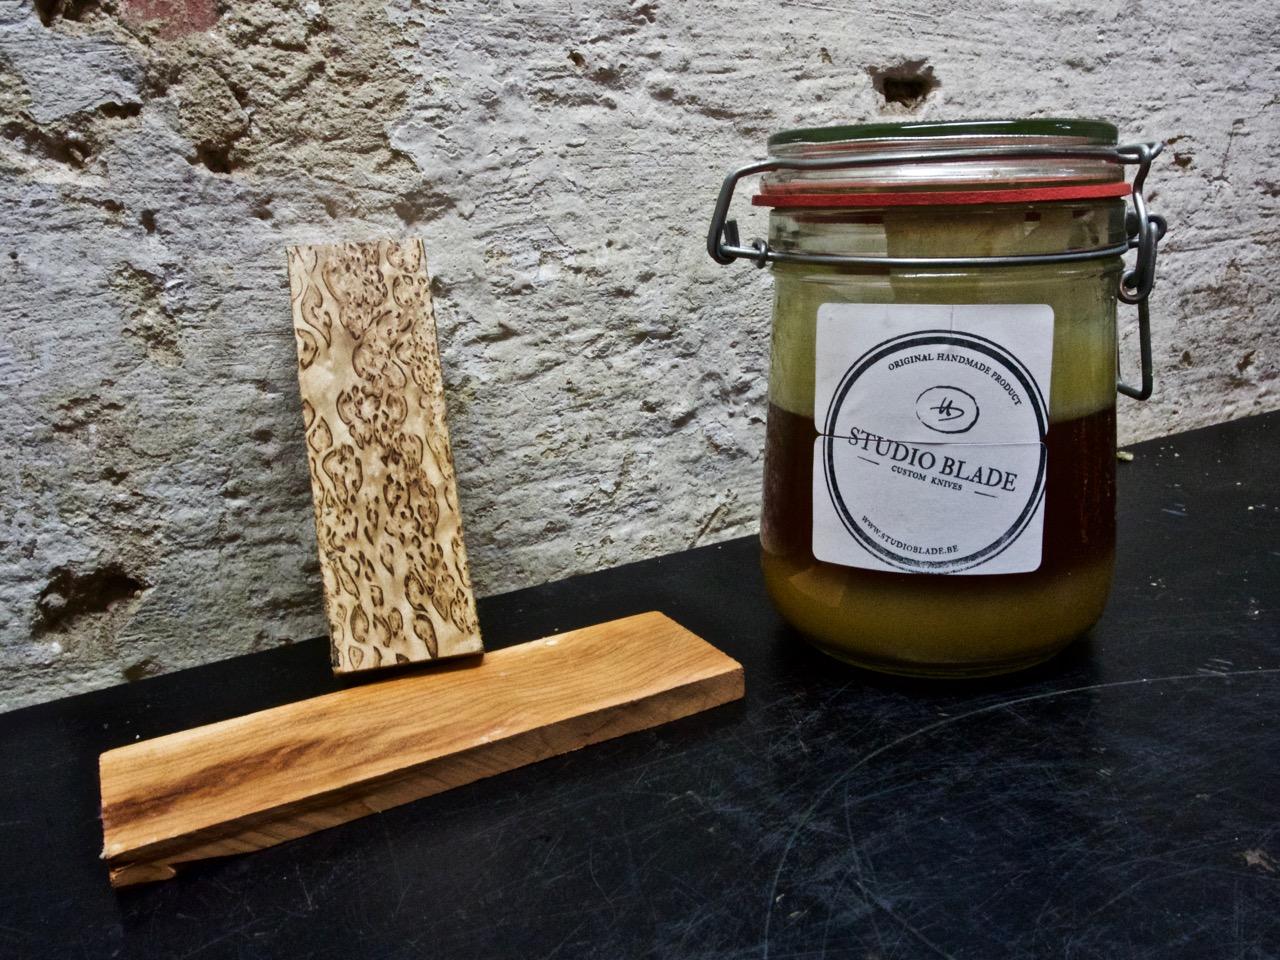 Beeswax Wood Finish Recipe Studio Blade